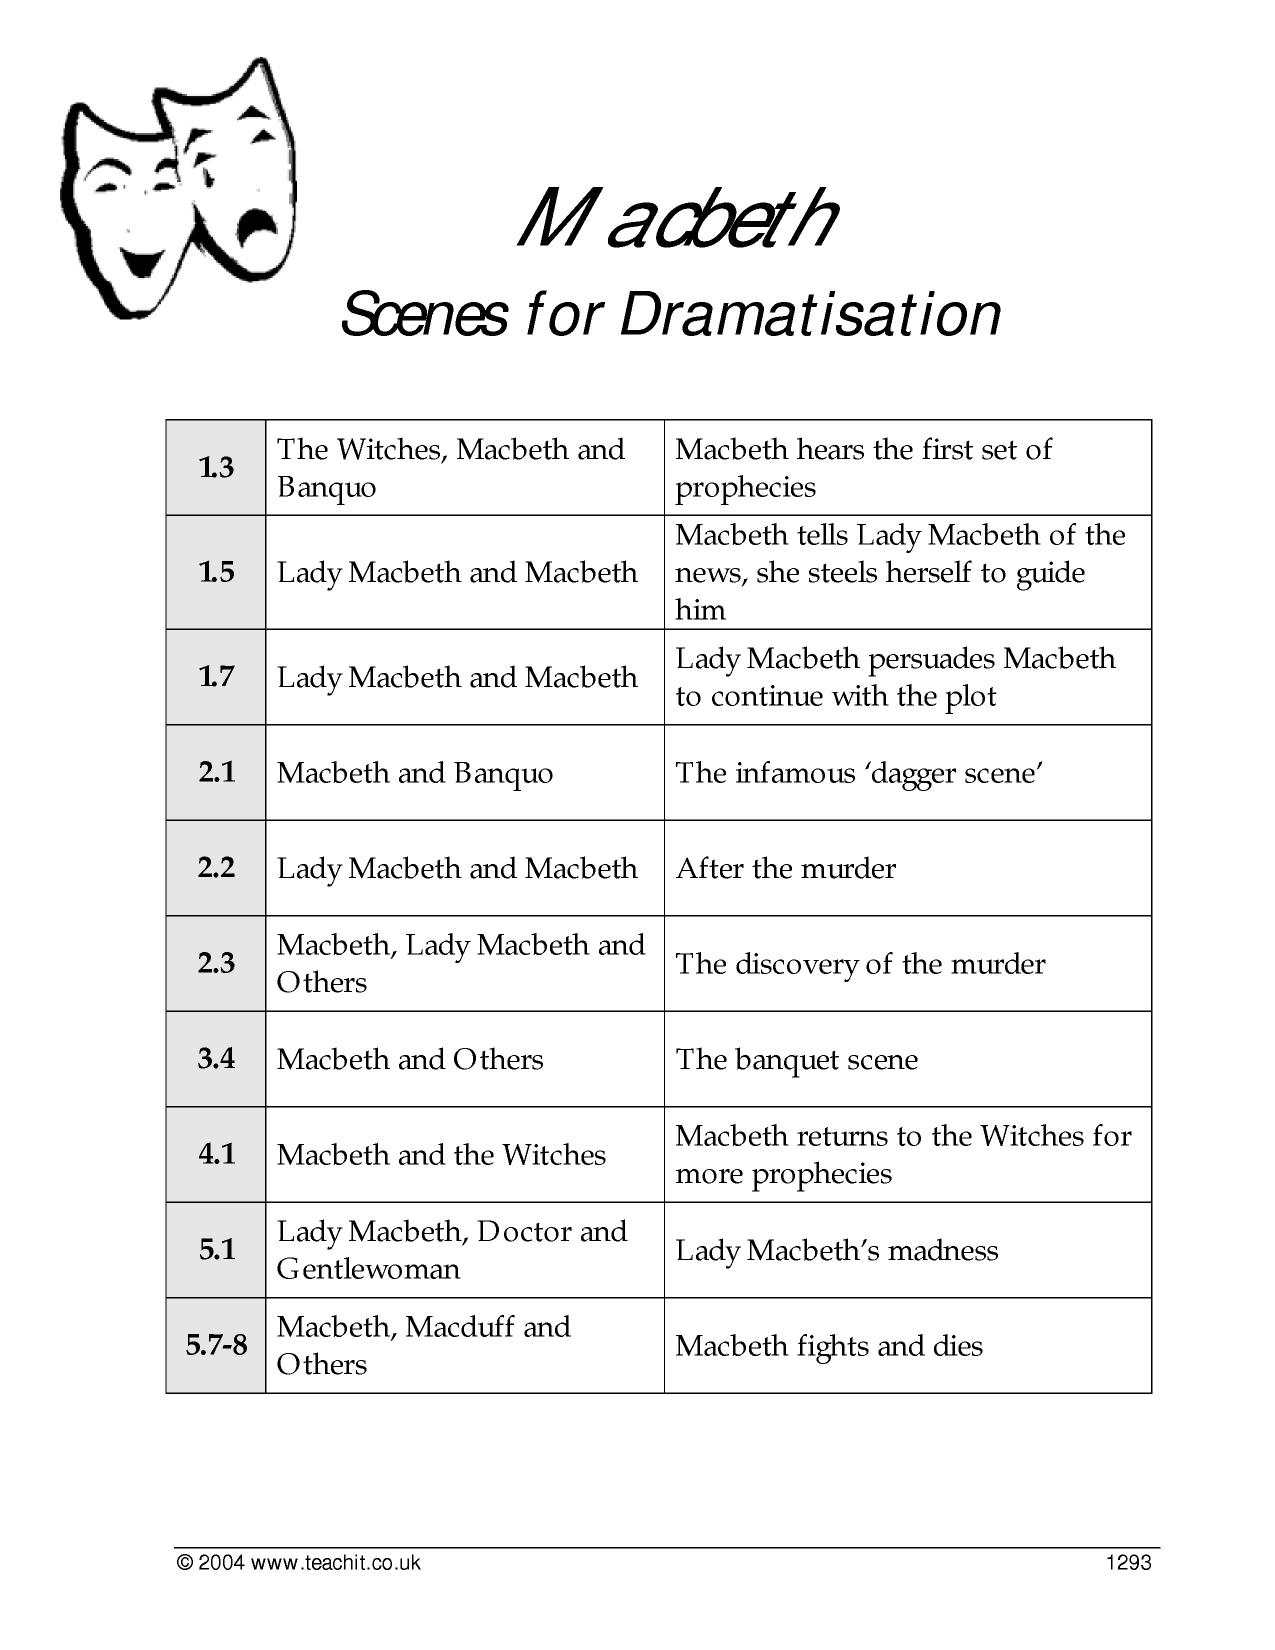 lady macbeth passage analysis essay example